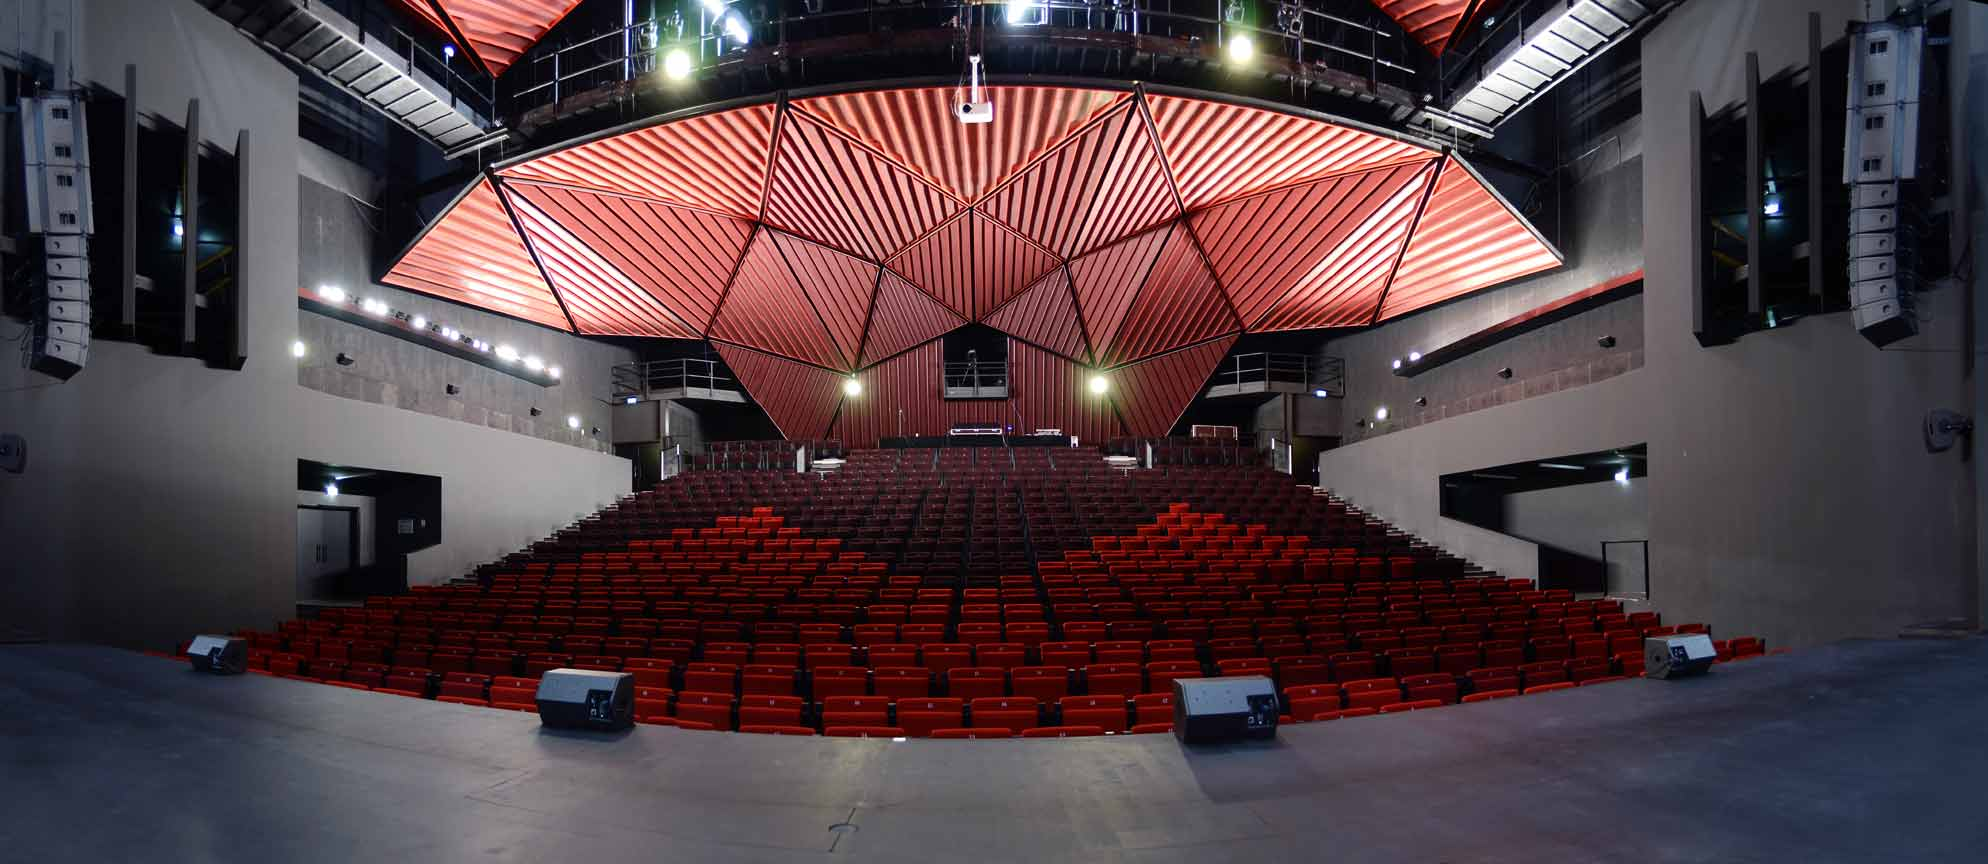 https://the-place-to-be.fr/wp-content/uploads/2021/01/programme-saison-2021-rocher-palmer-cenon-pres-bordeaux-be3bc216.jpg